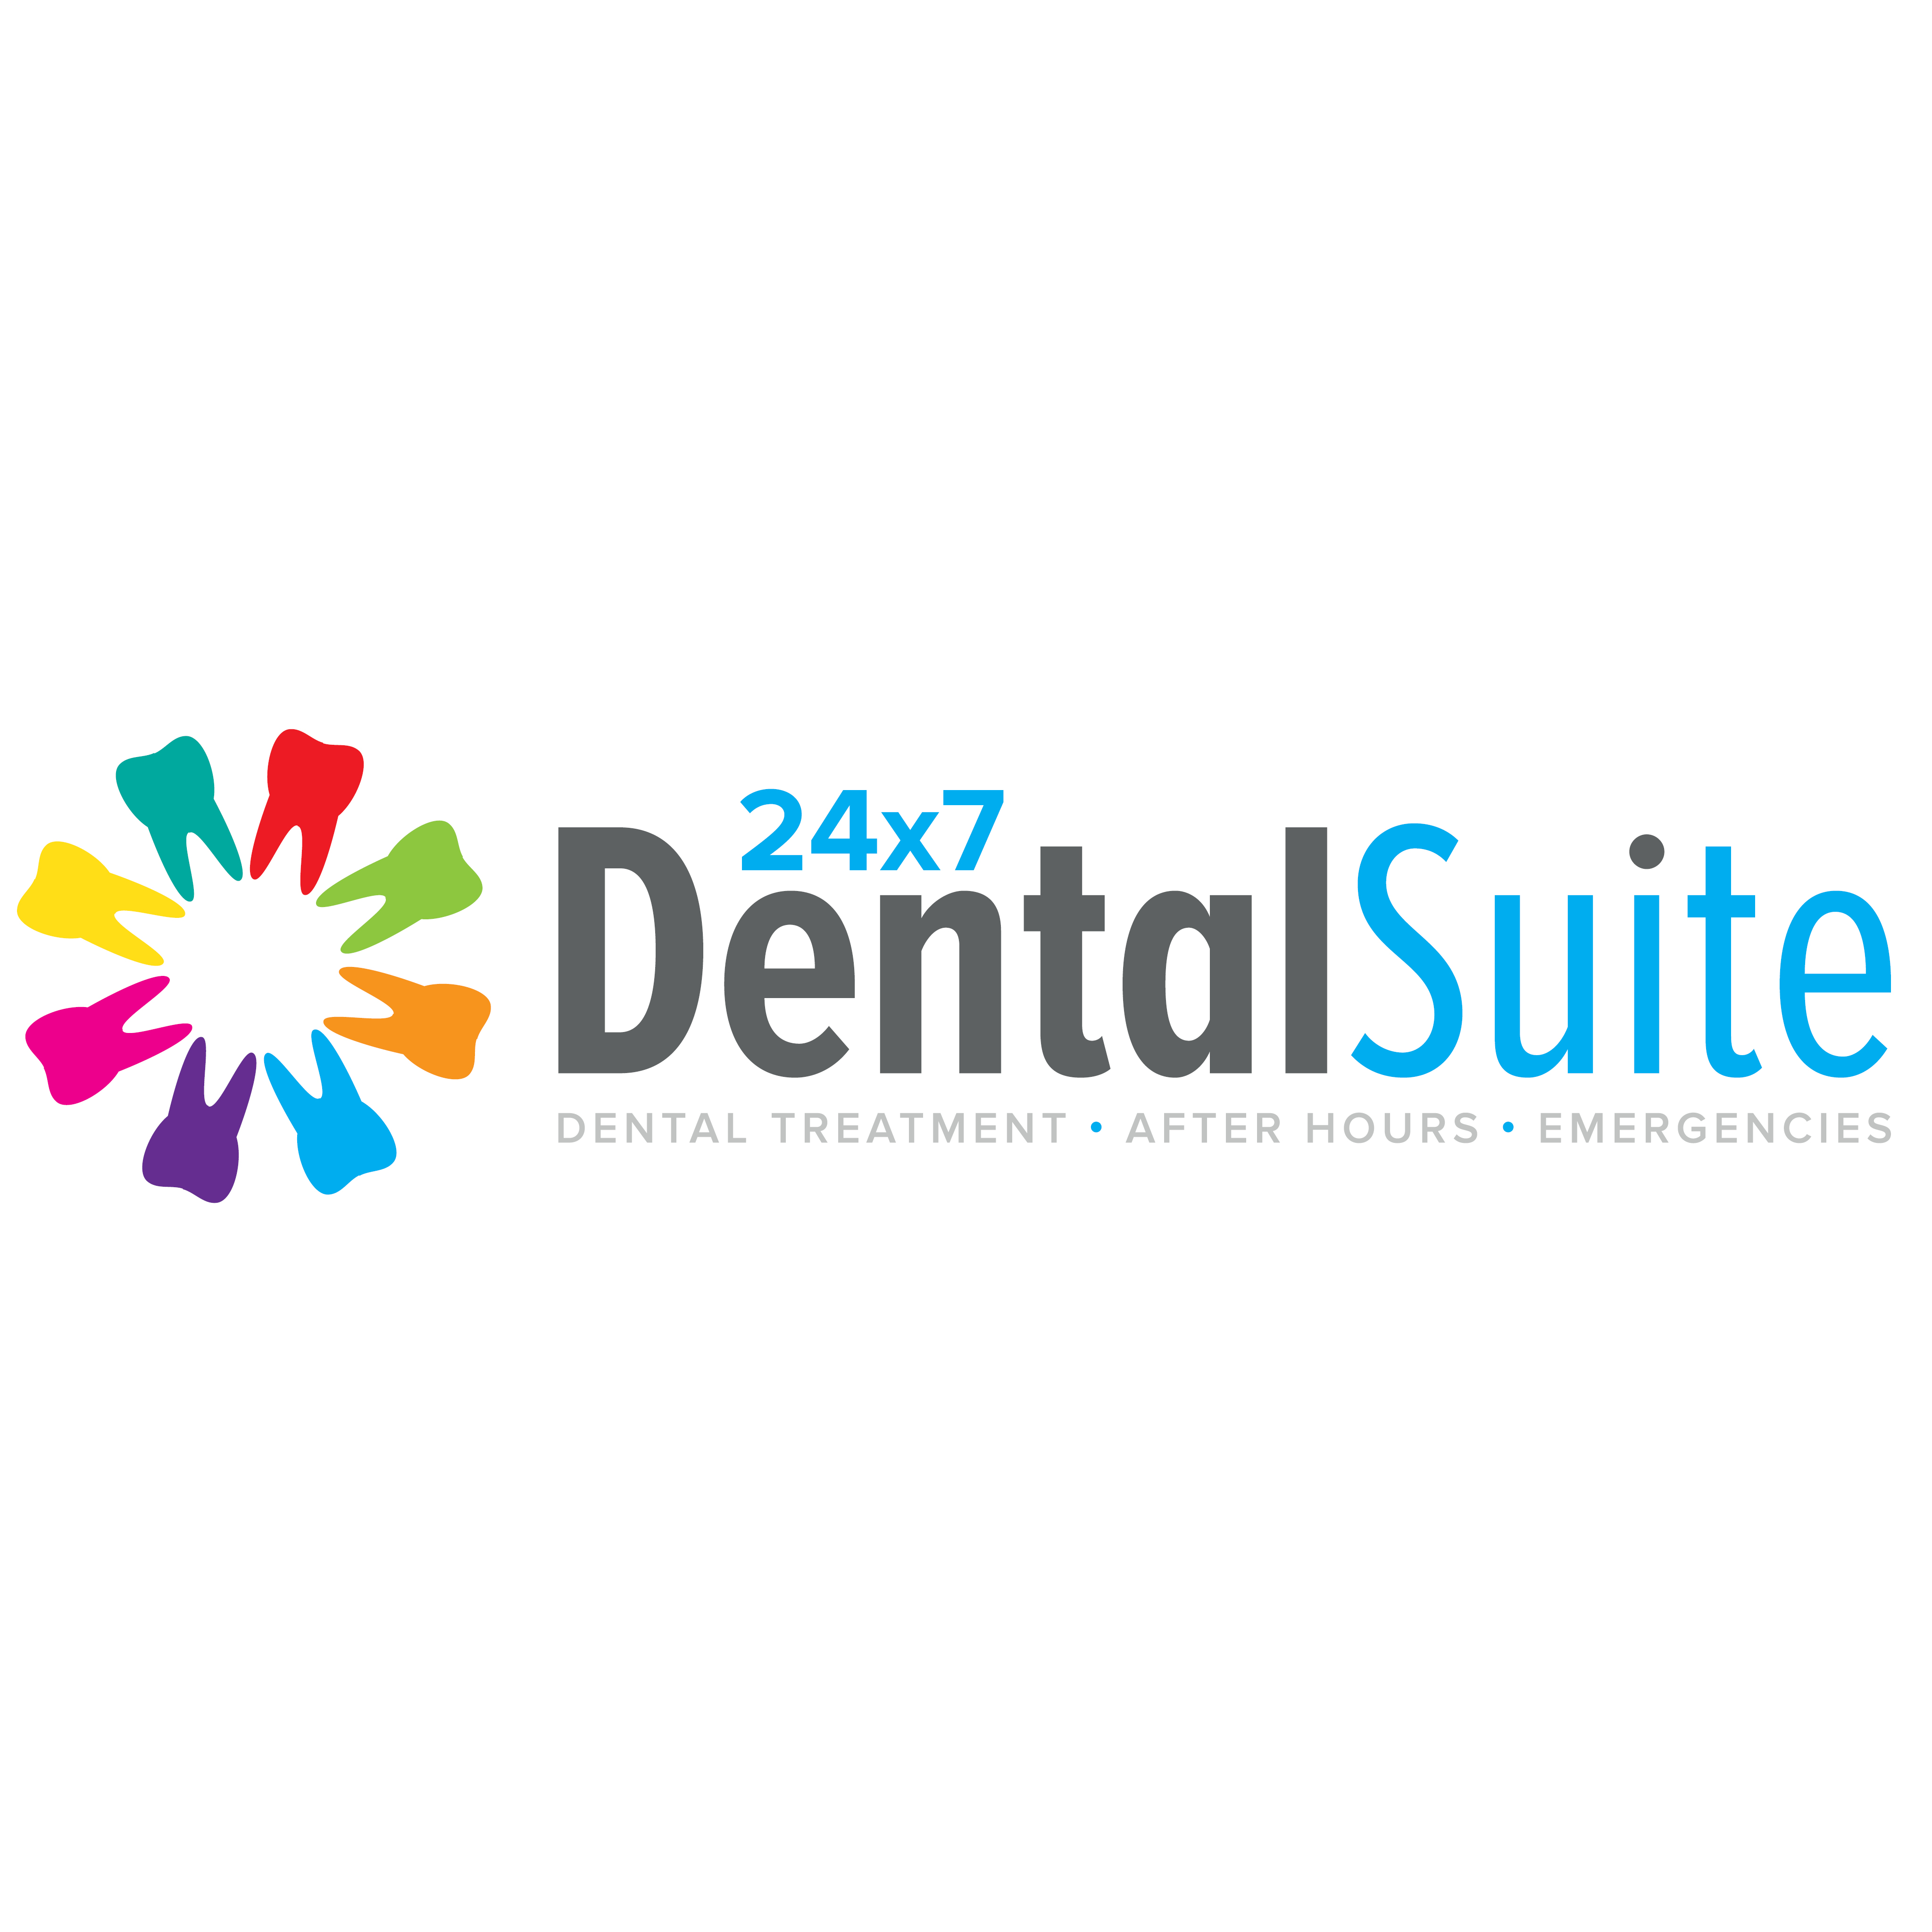 24x7 Dental Suite